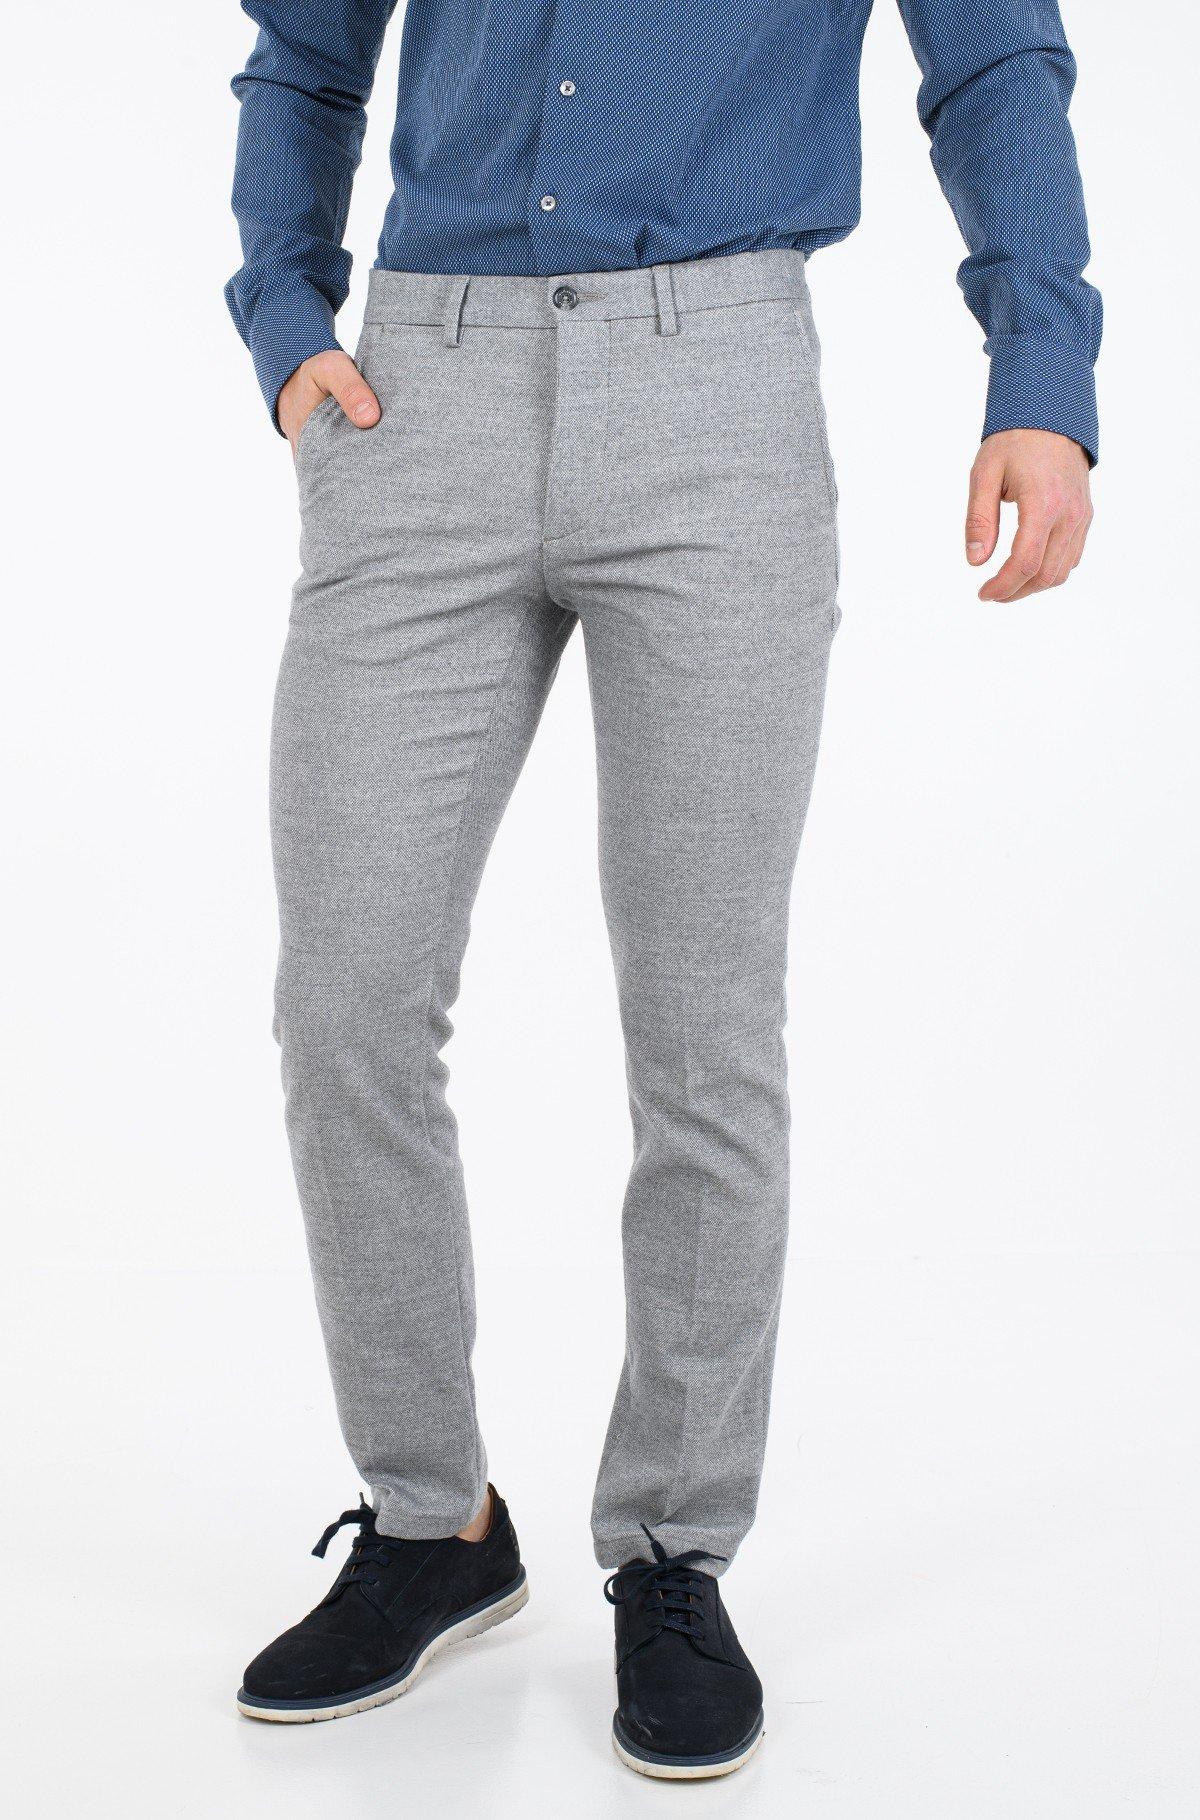 Suit trousers DENTON CHINO WOOL LOOK FLEX-full-1